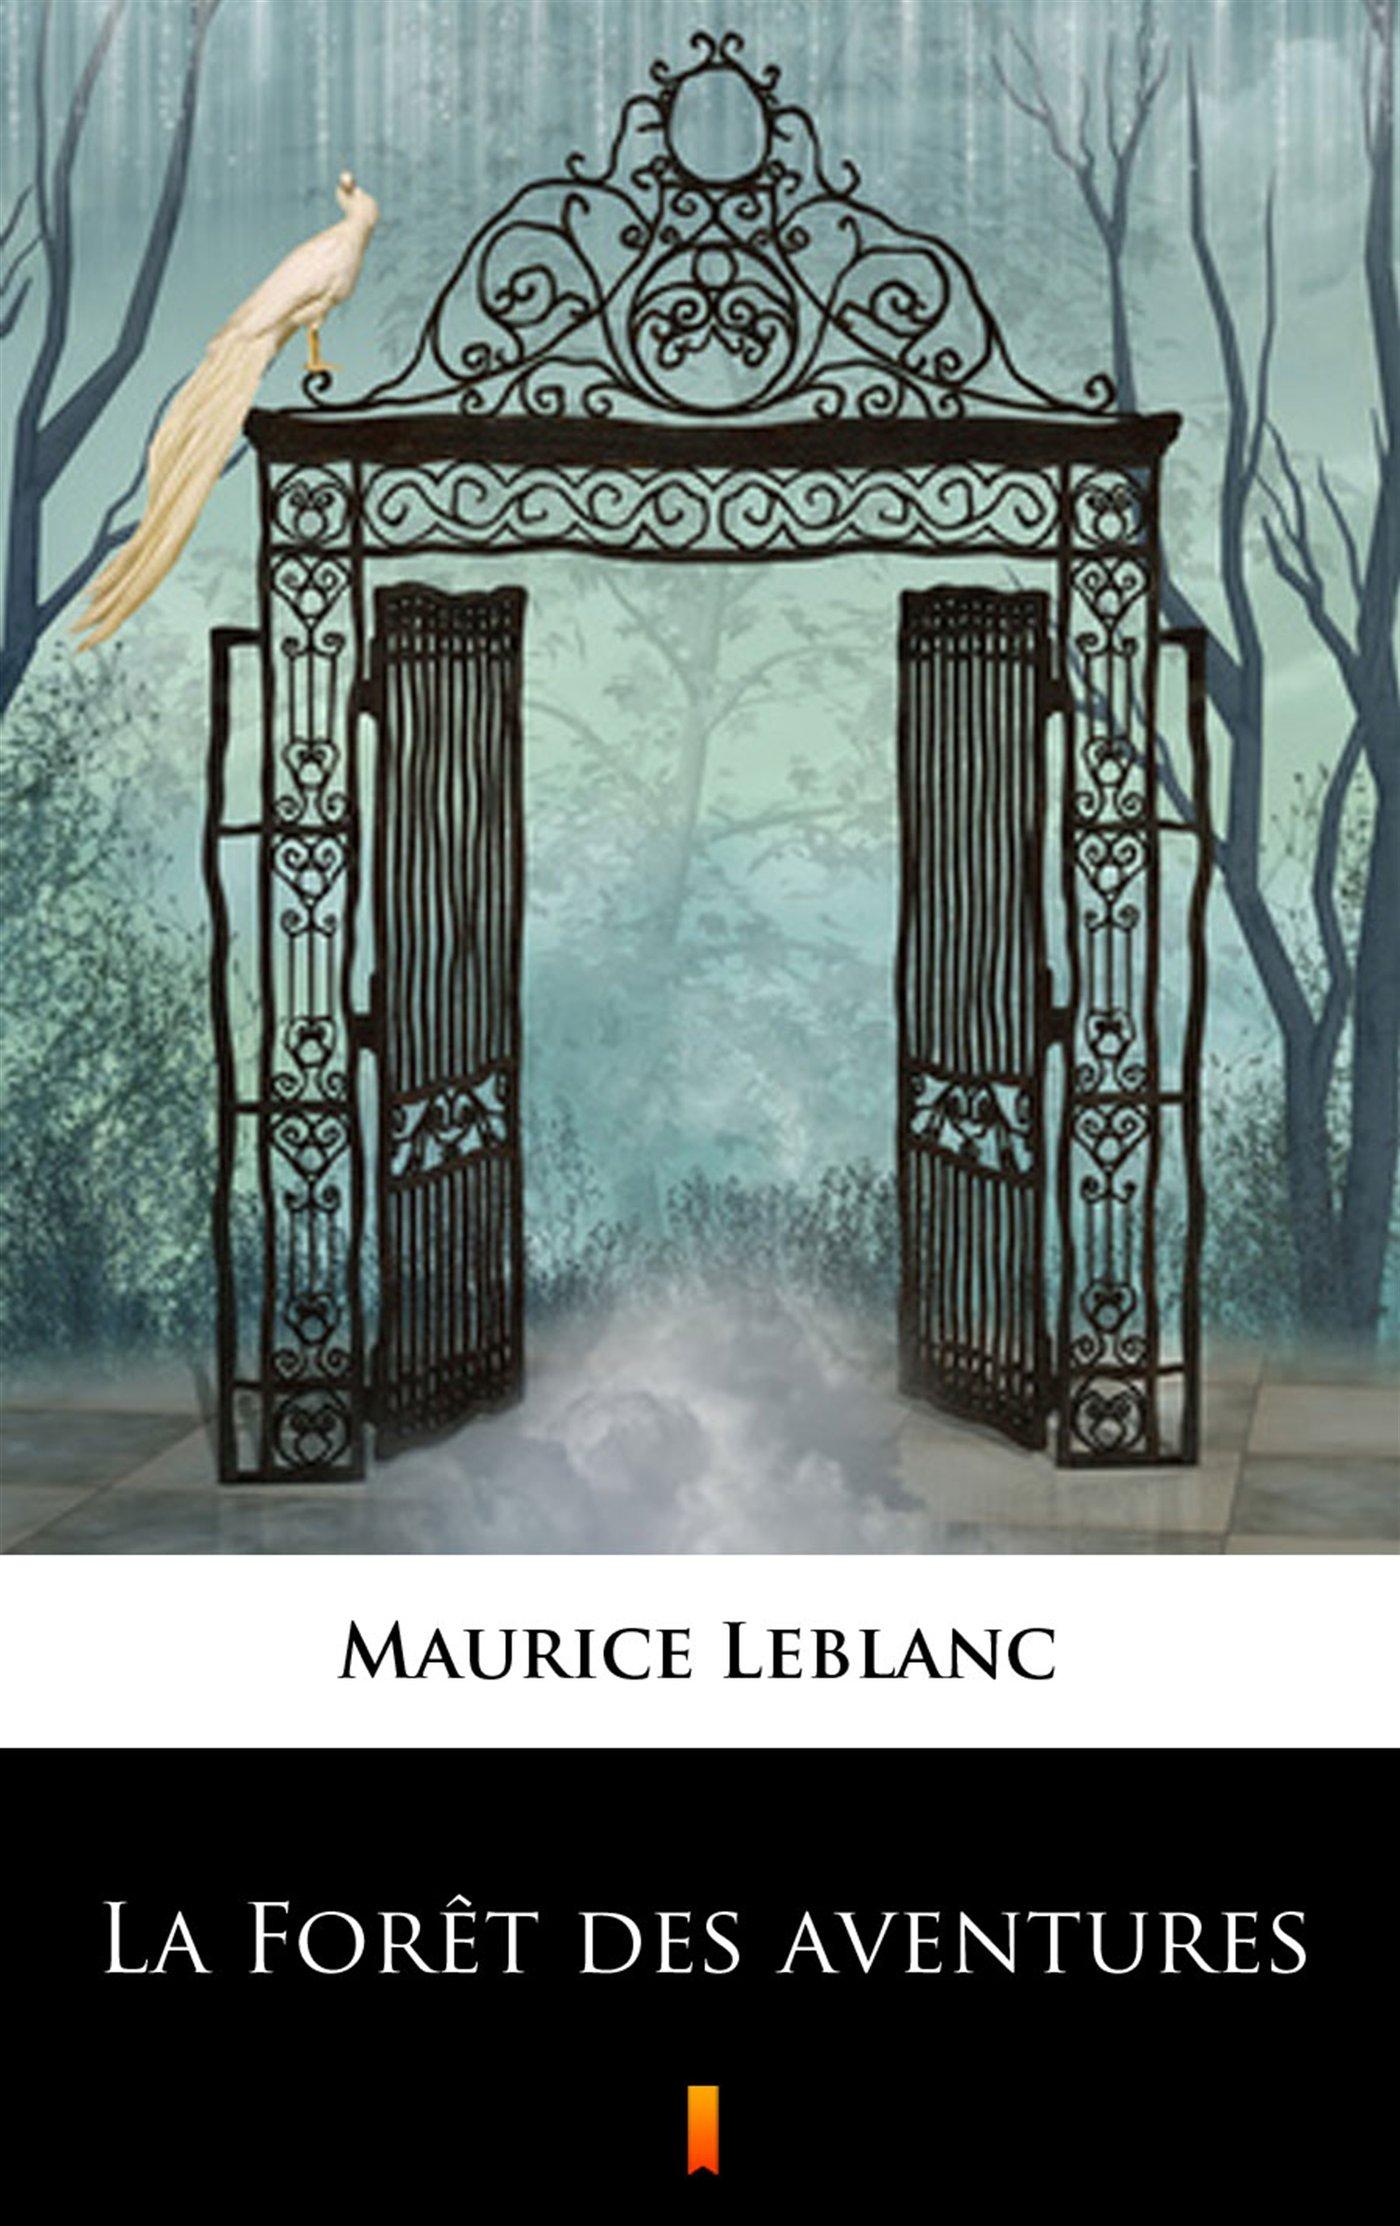 La Foret des aventures - Ebook (Książka na Kindle) do pobrania w formacie MOBI